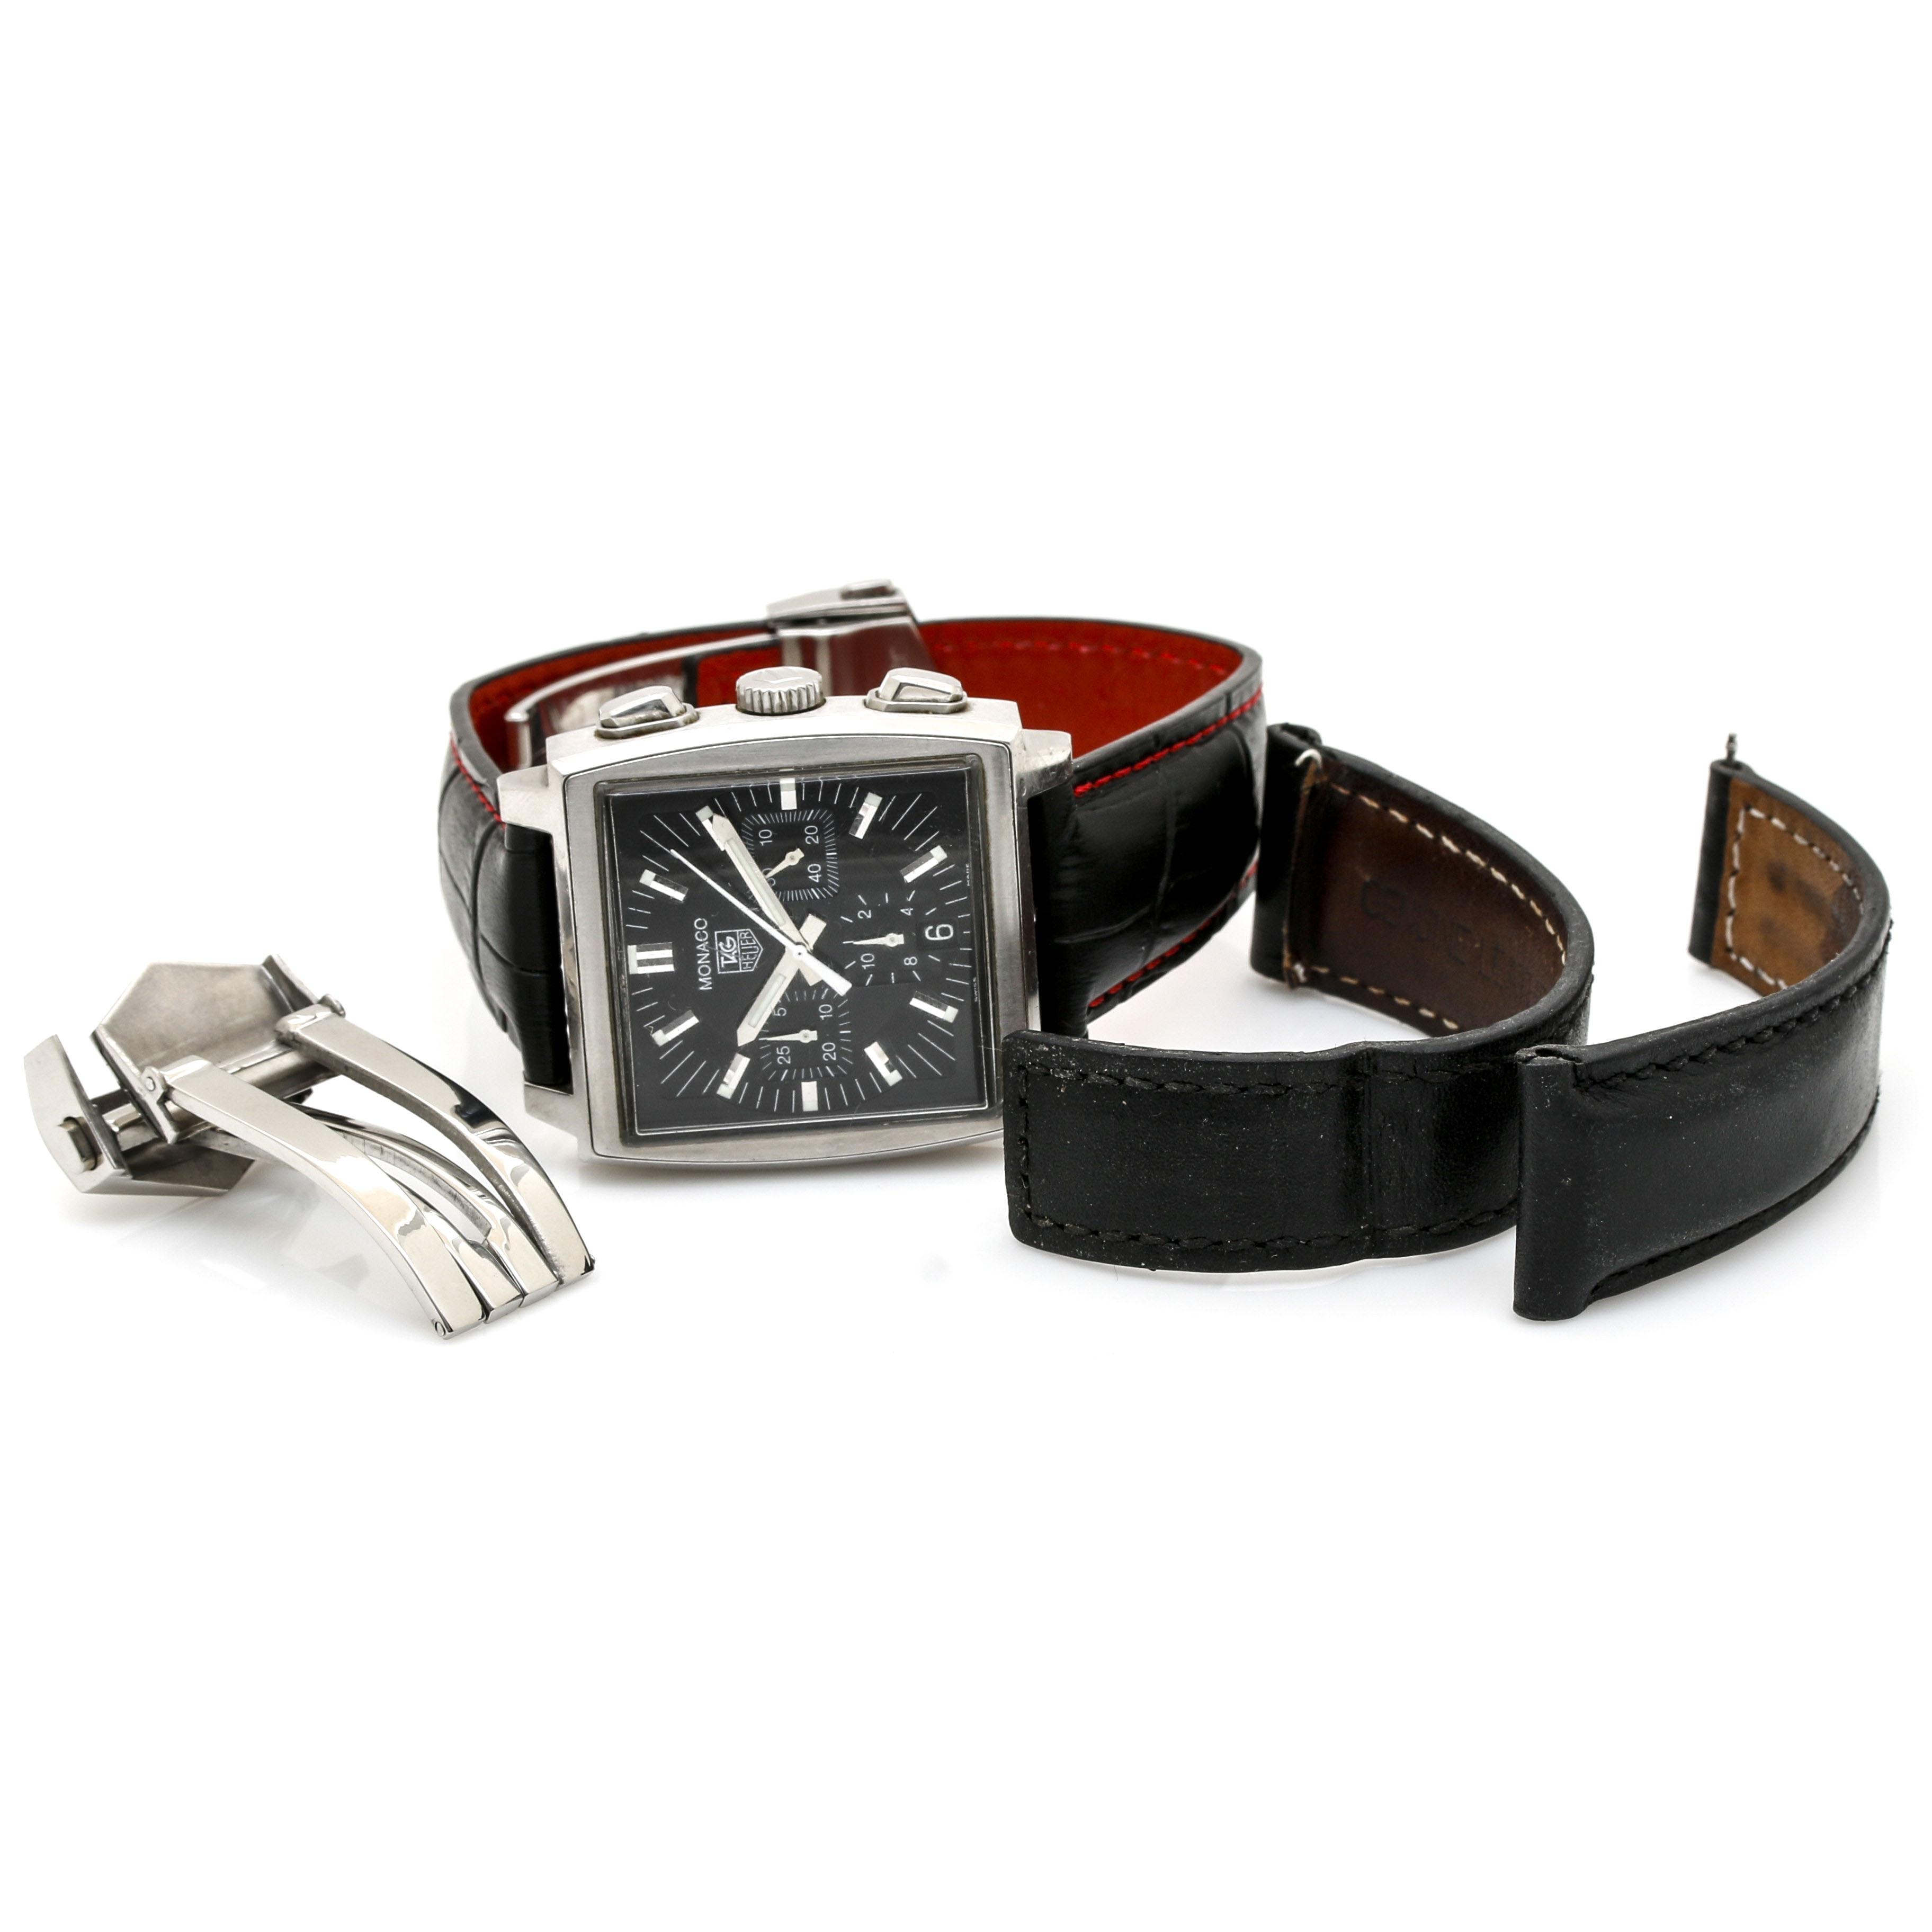 TAG Heuer Monaco Stainless Steel Wristwatch